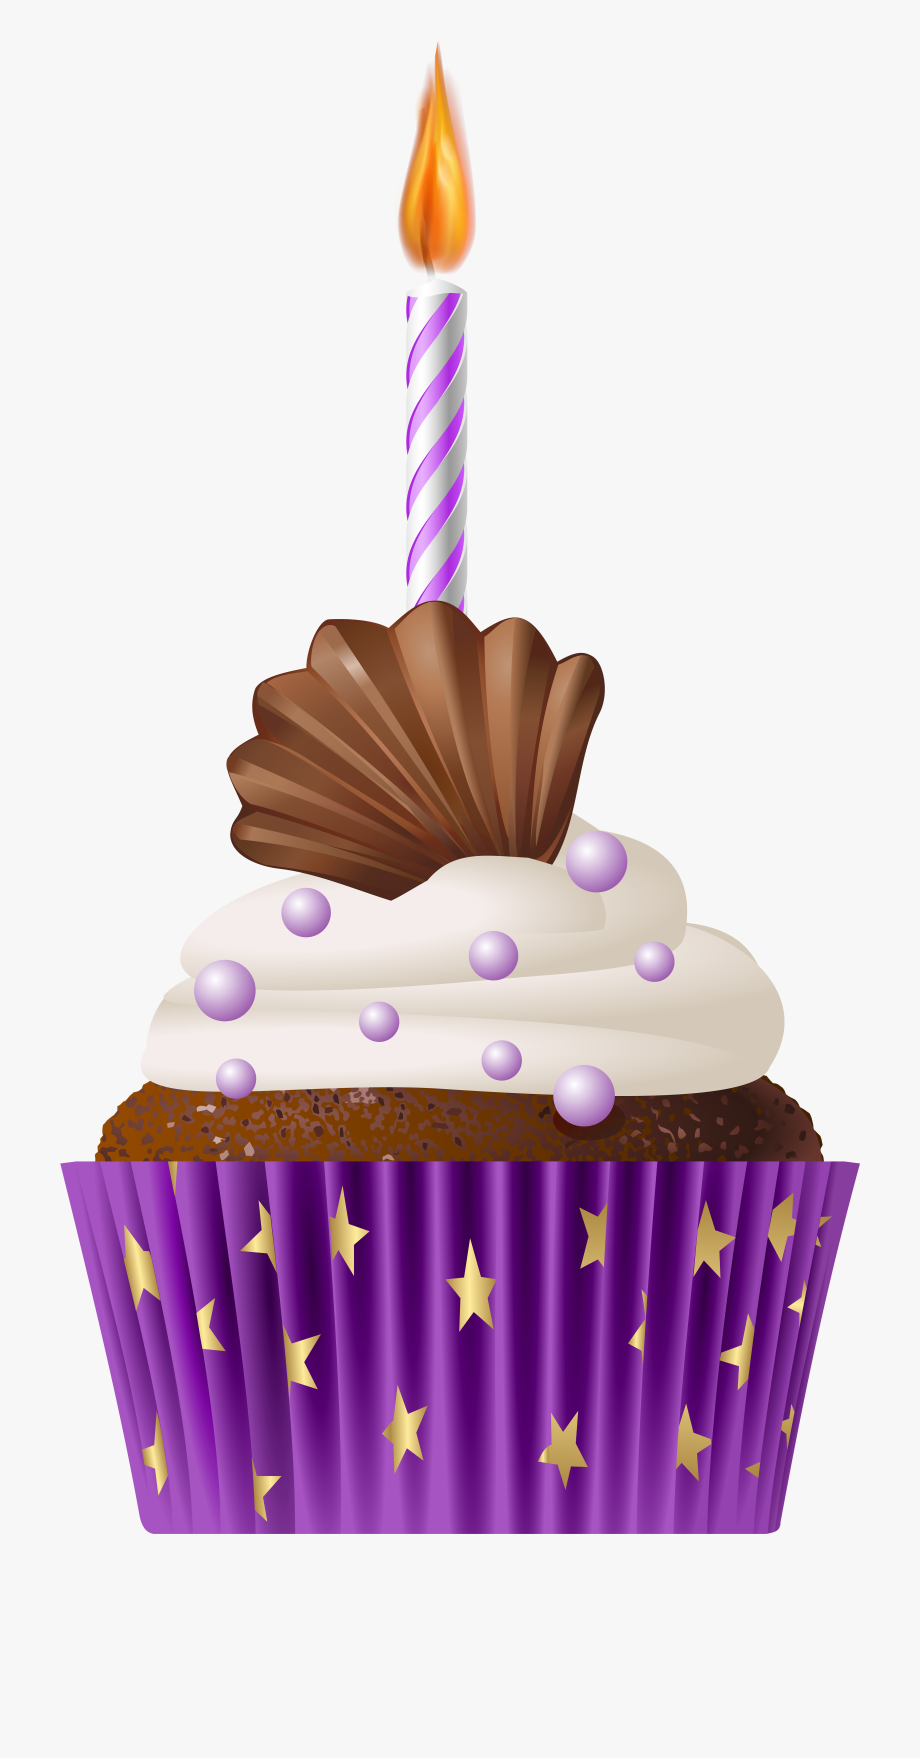 Muffins clipart cupcake birthday. Muffin purple cake candle